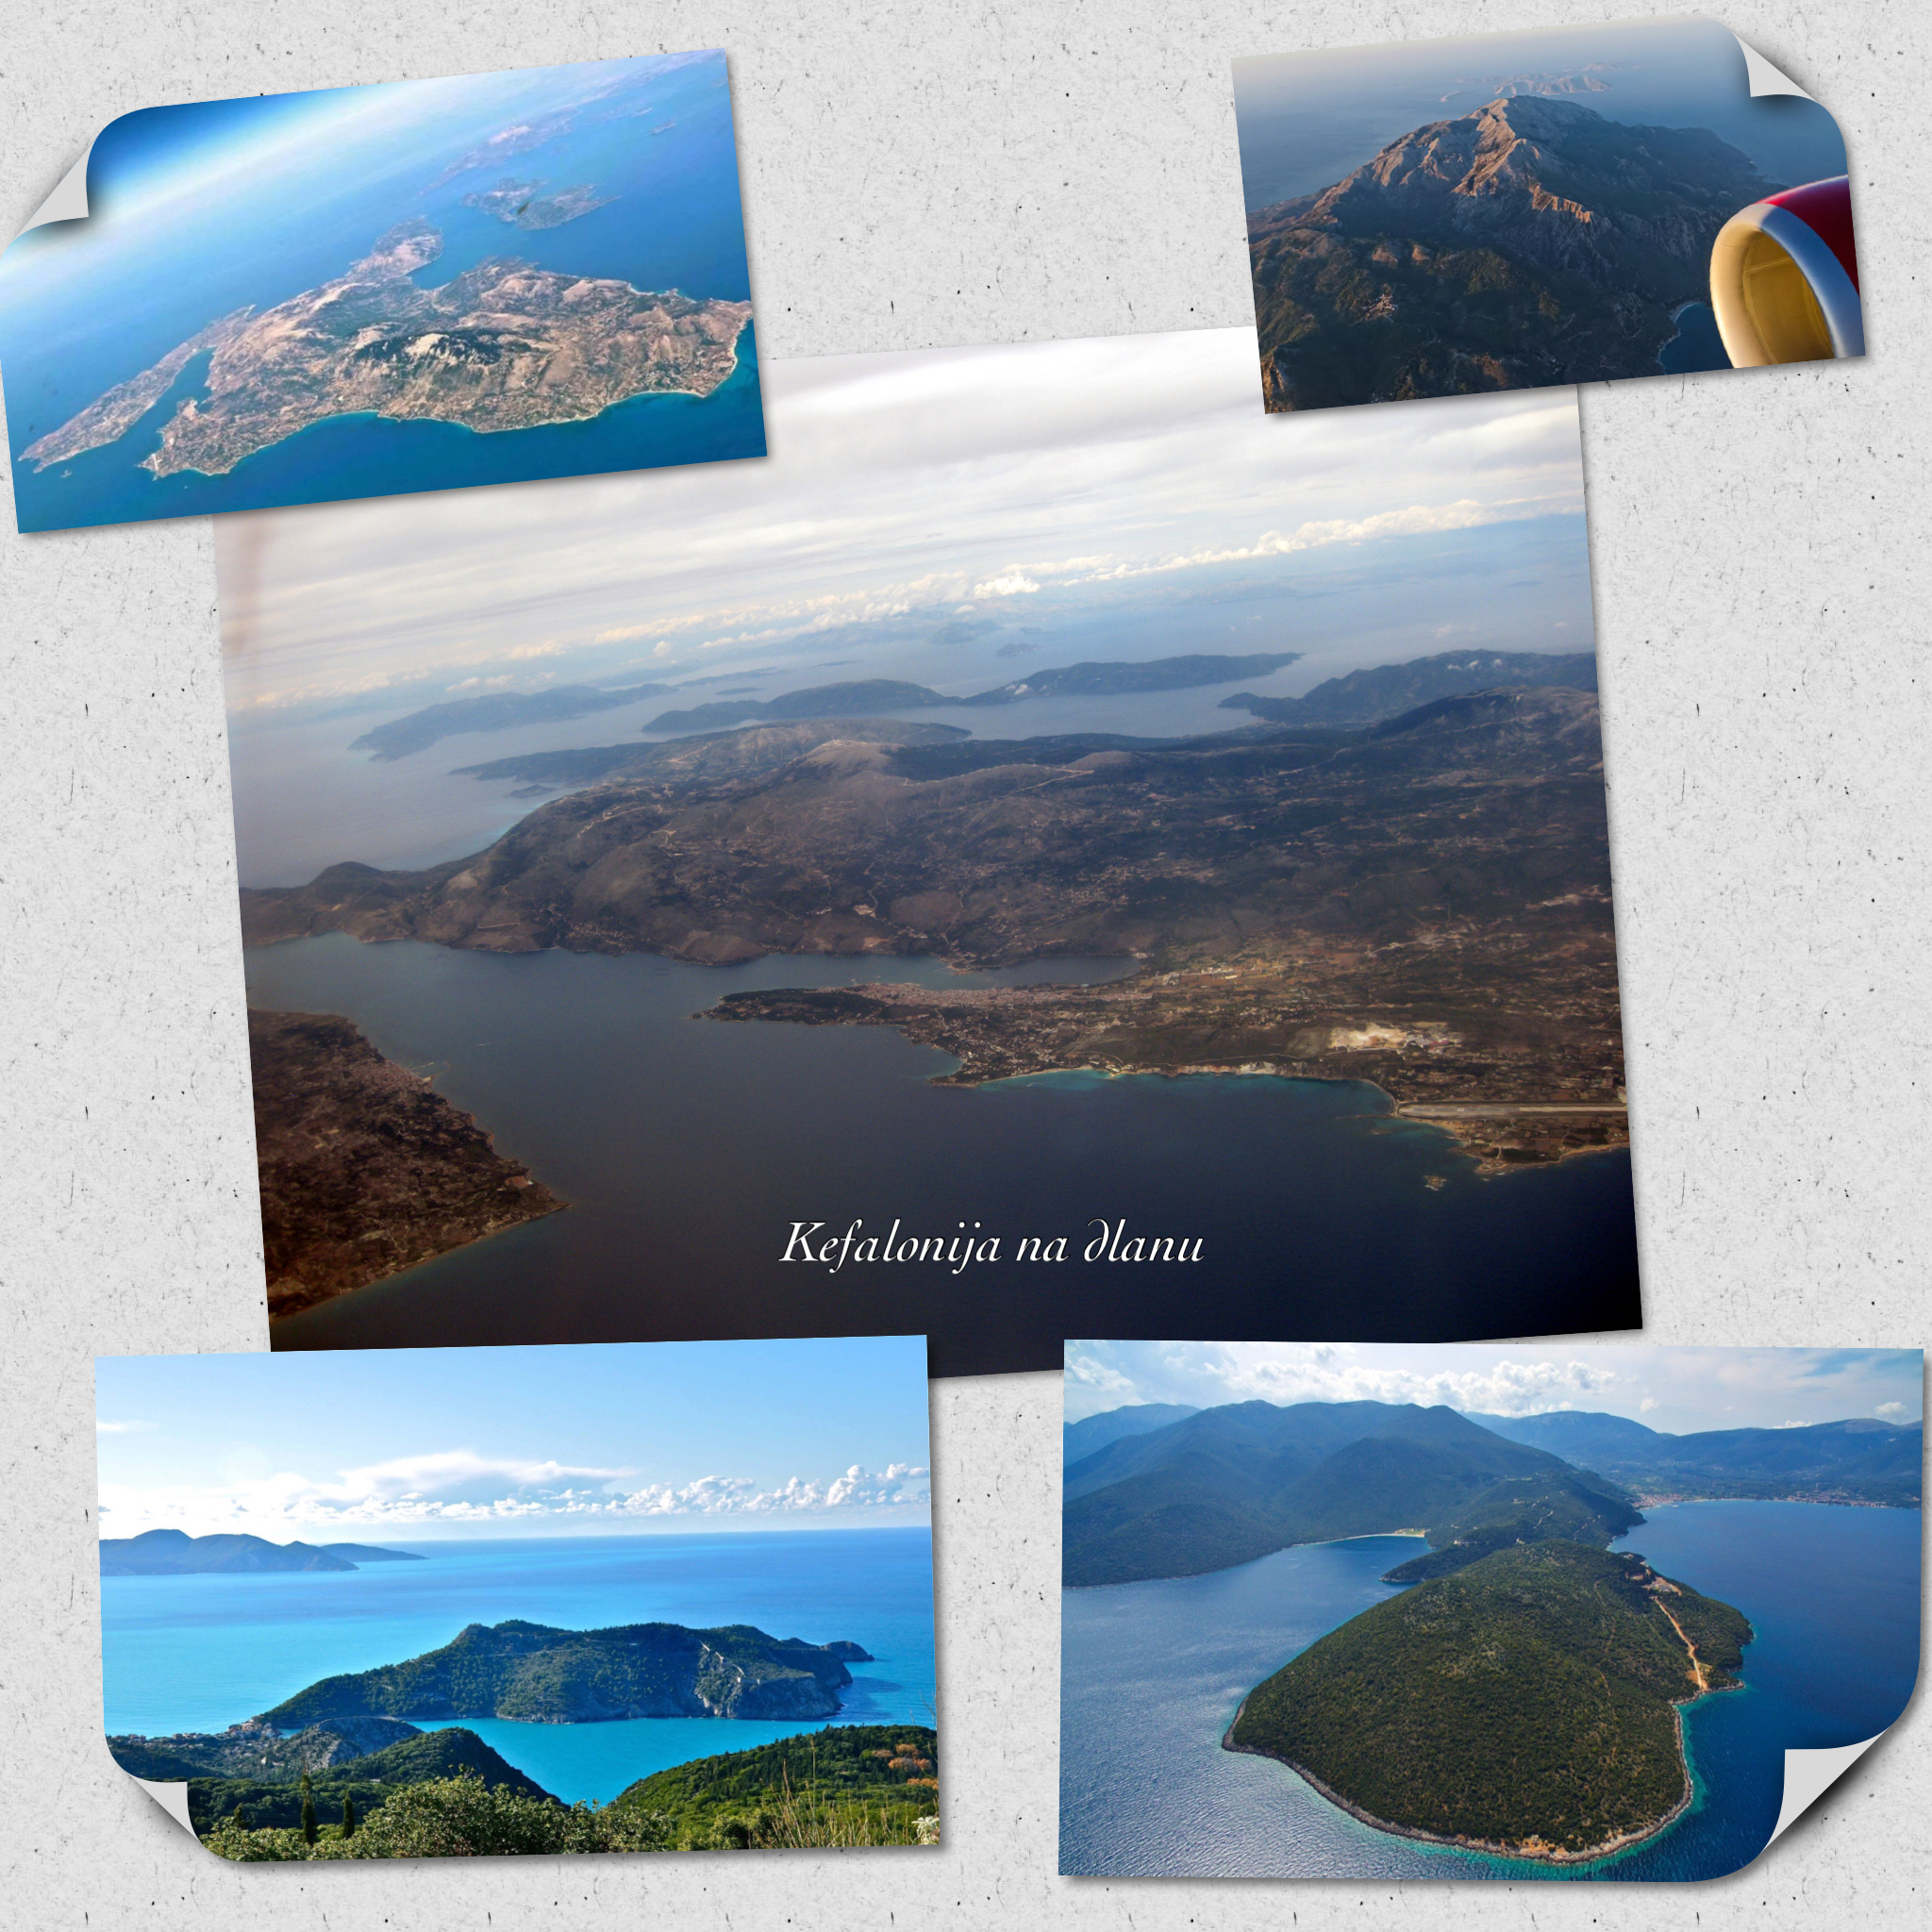 Cephalonia Island